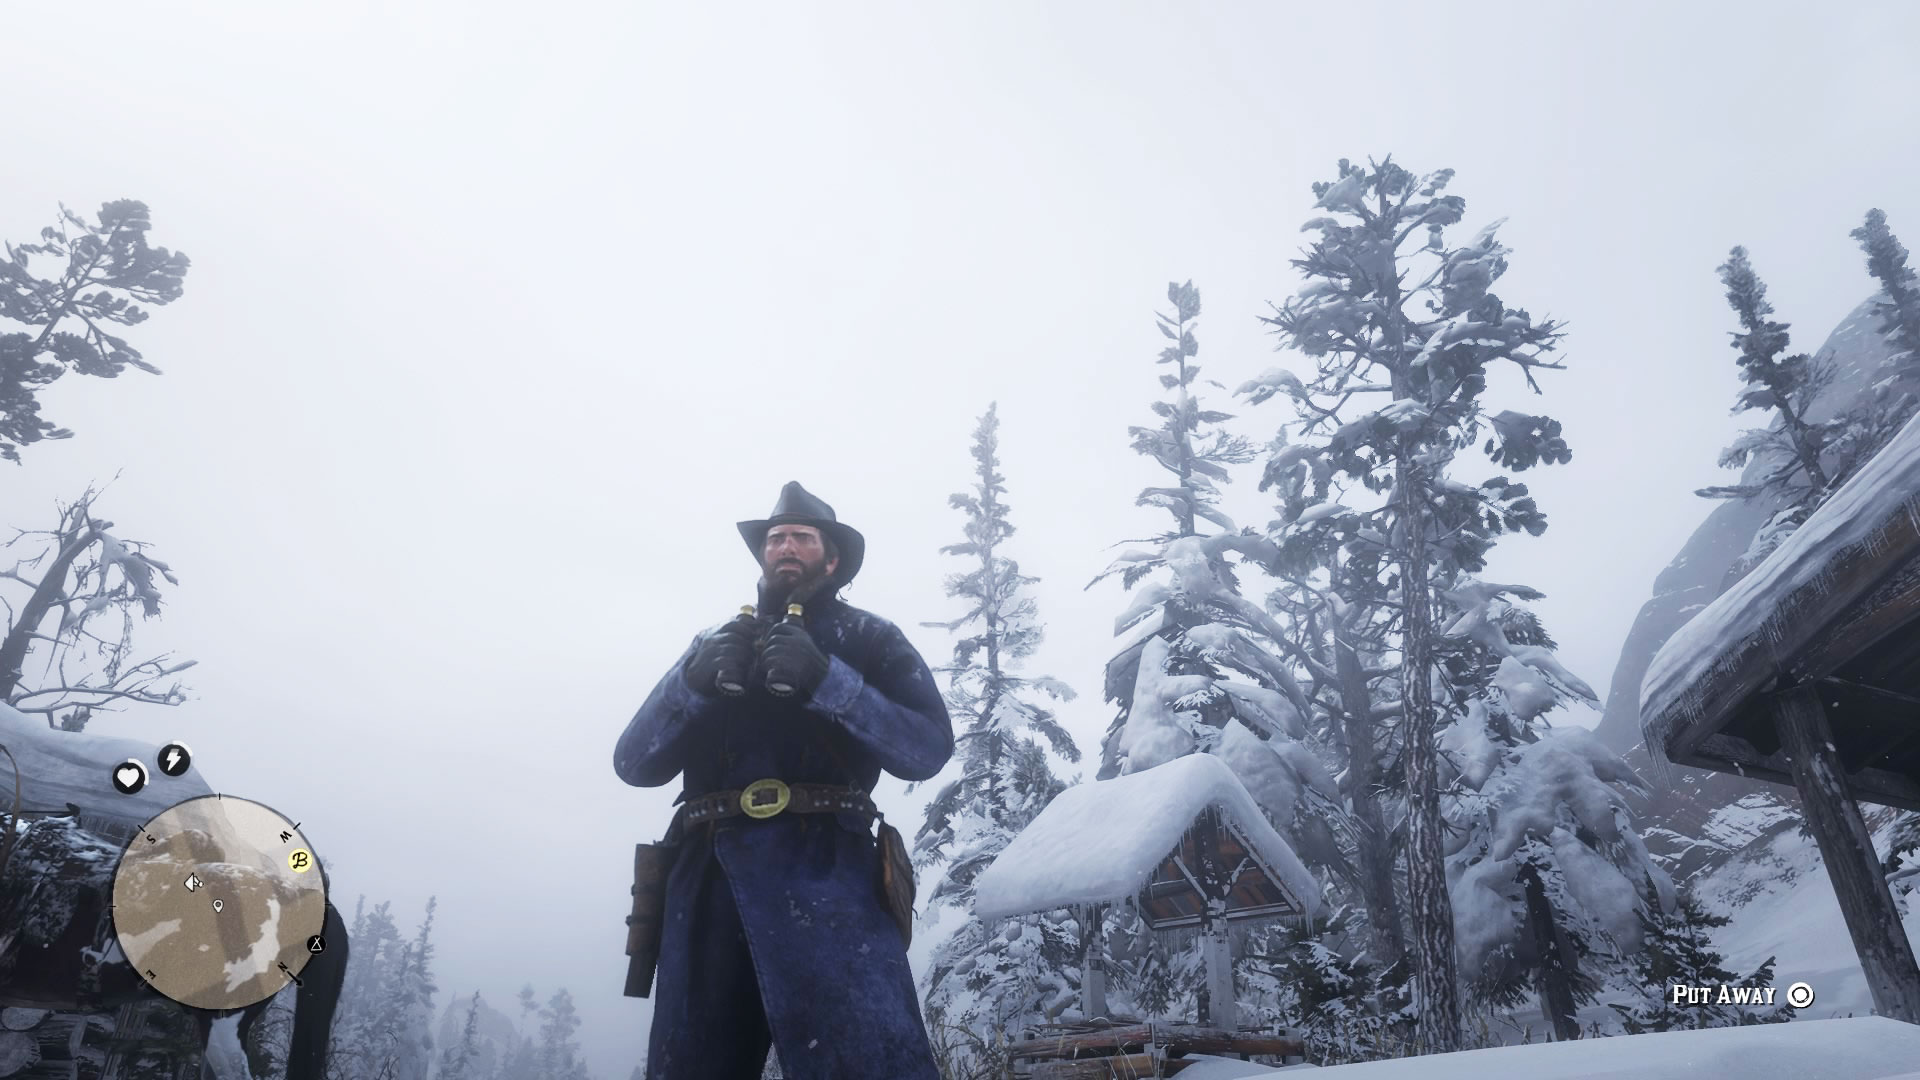 Arthur Morgan, birder. Image: Courtesy of Rockstar Games